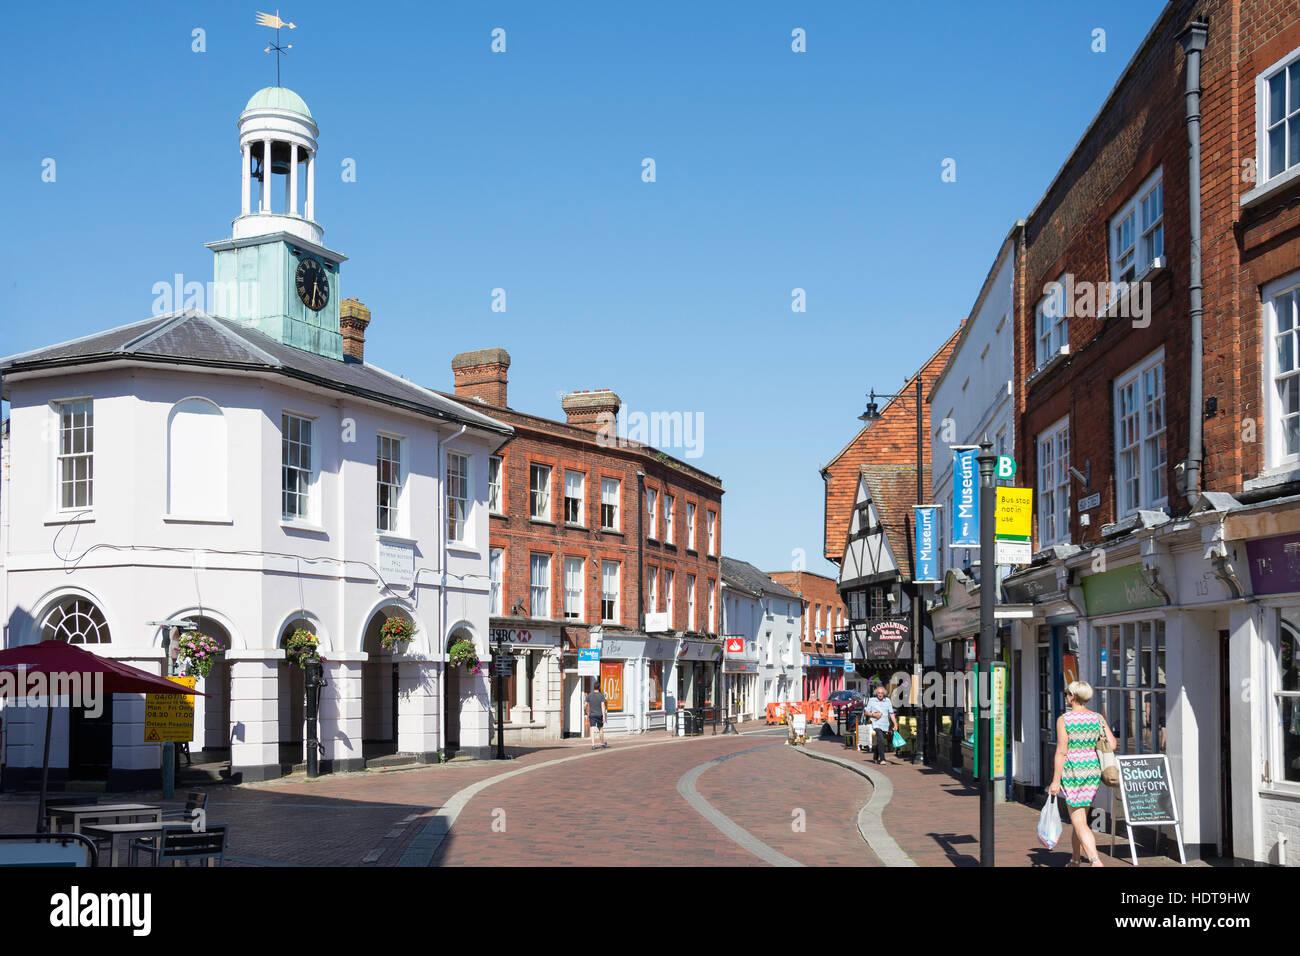 The 'Pepperpot' Clock Tower, High Street, Godalming, Surrey, England, United Kingdom - Stock Image